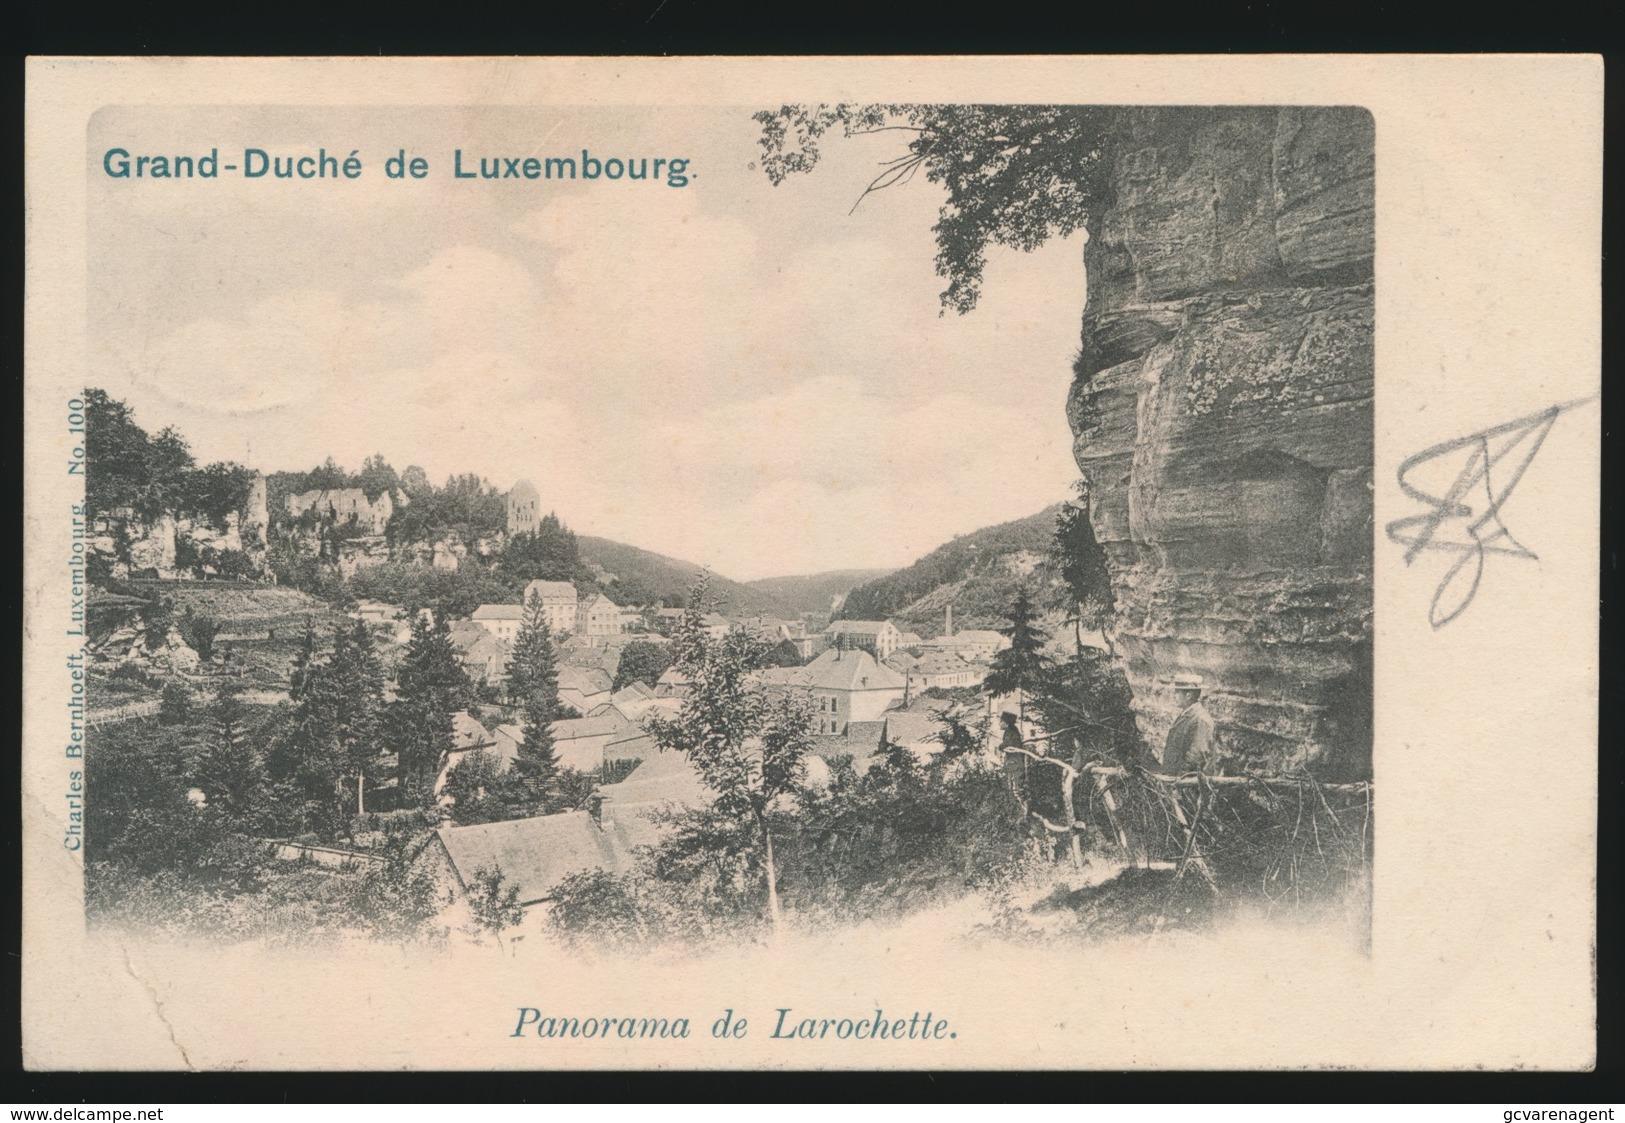 PANORAMA DE LAROCHETTE - Larochette